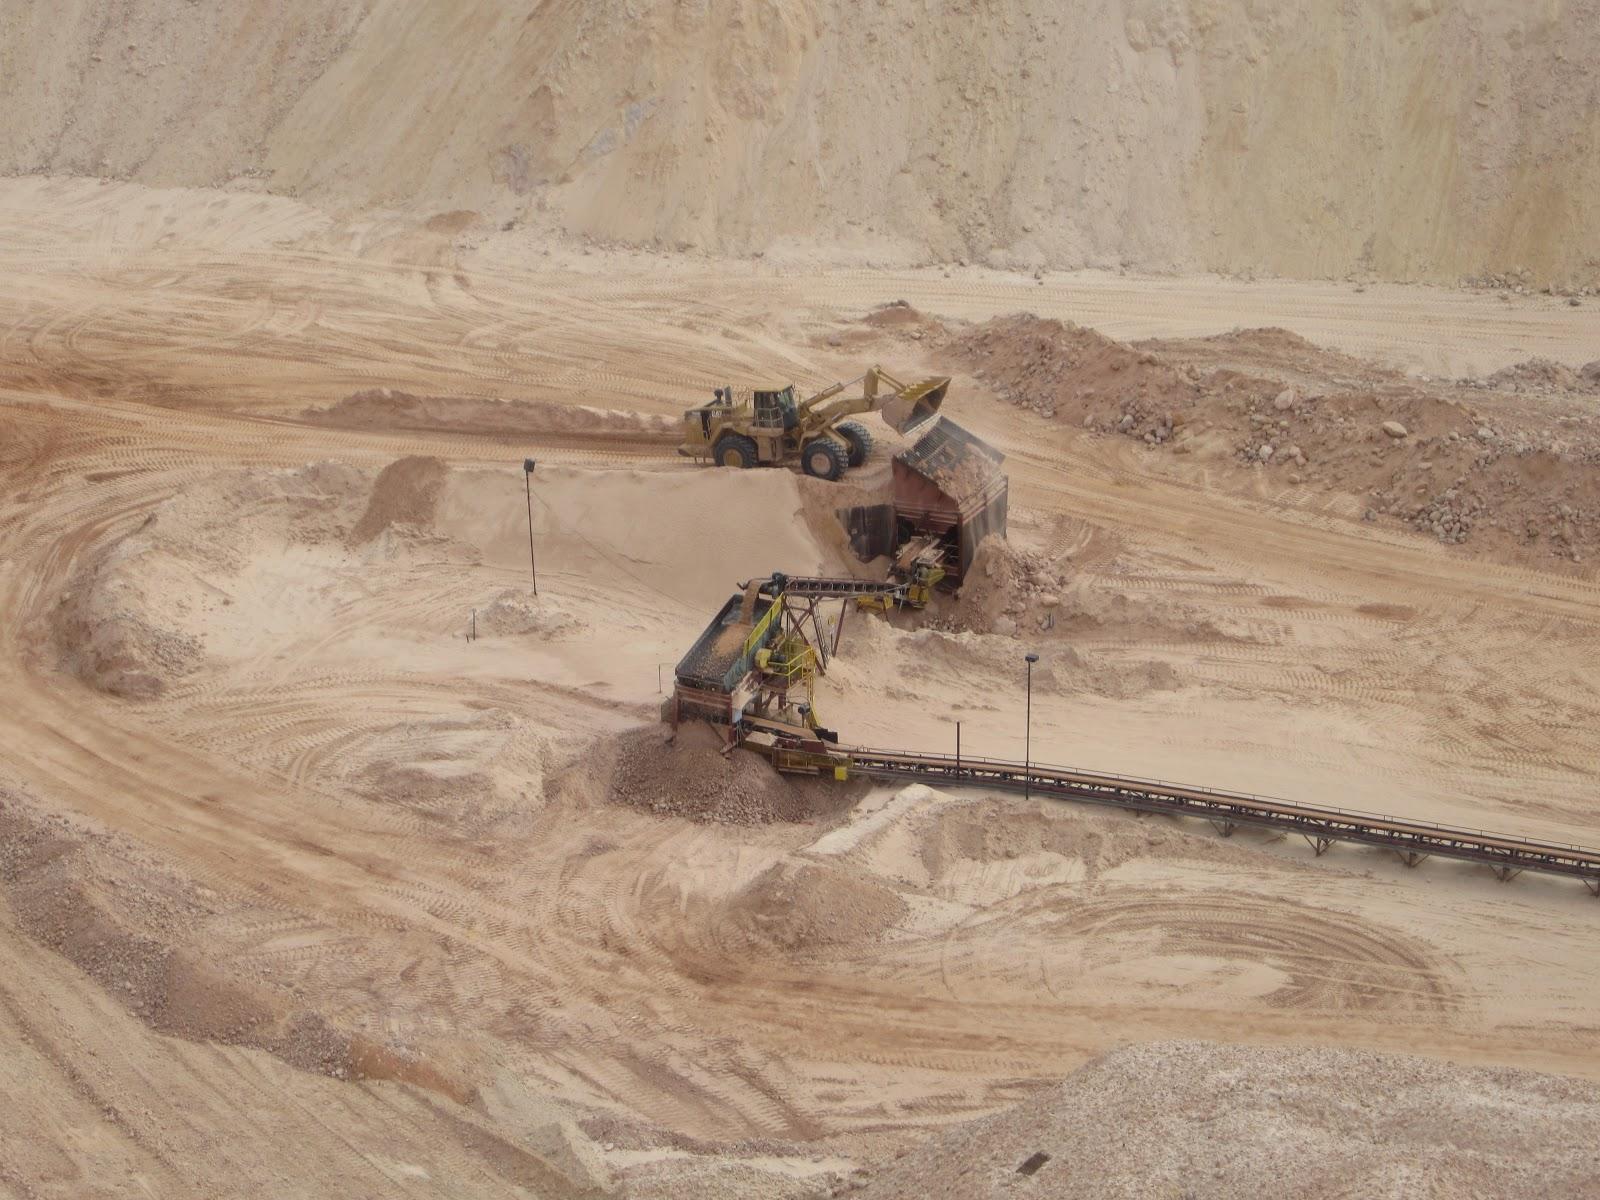 Sand mine in Nevada